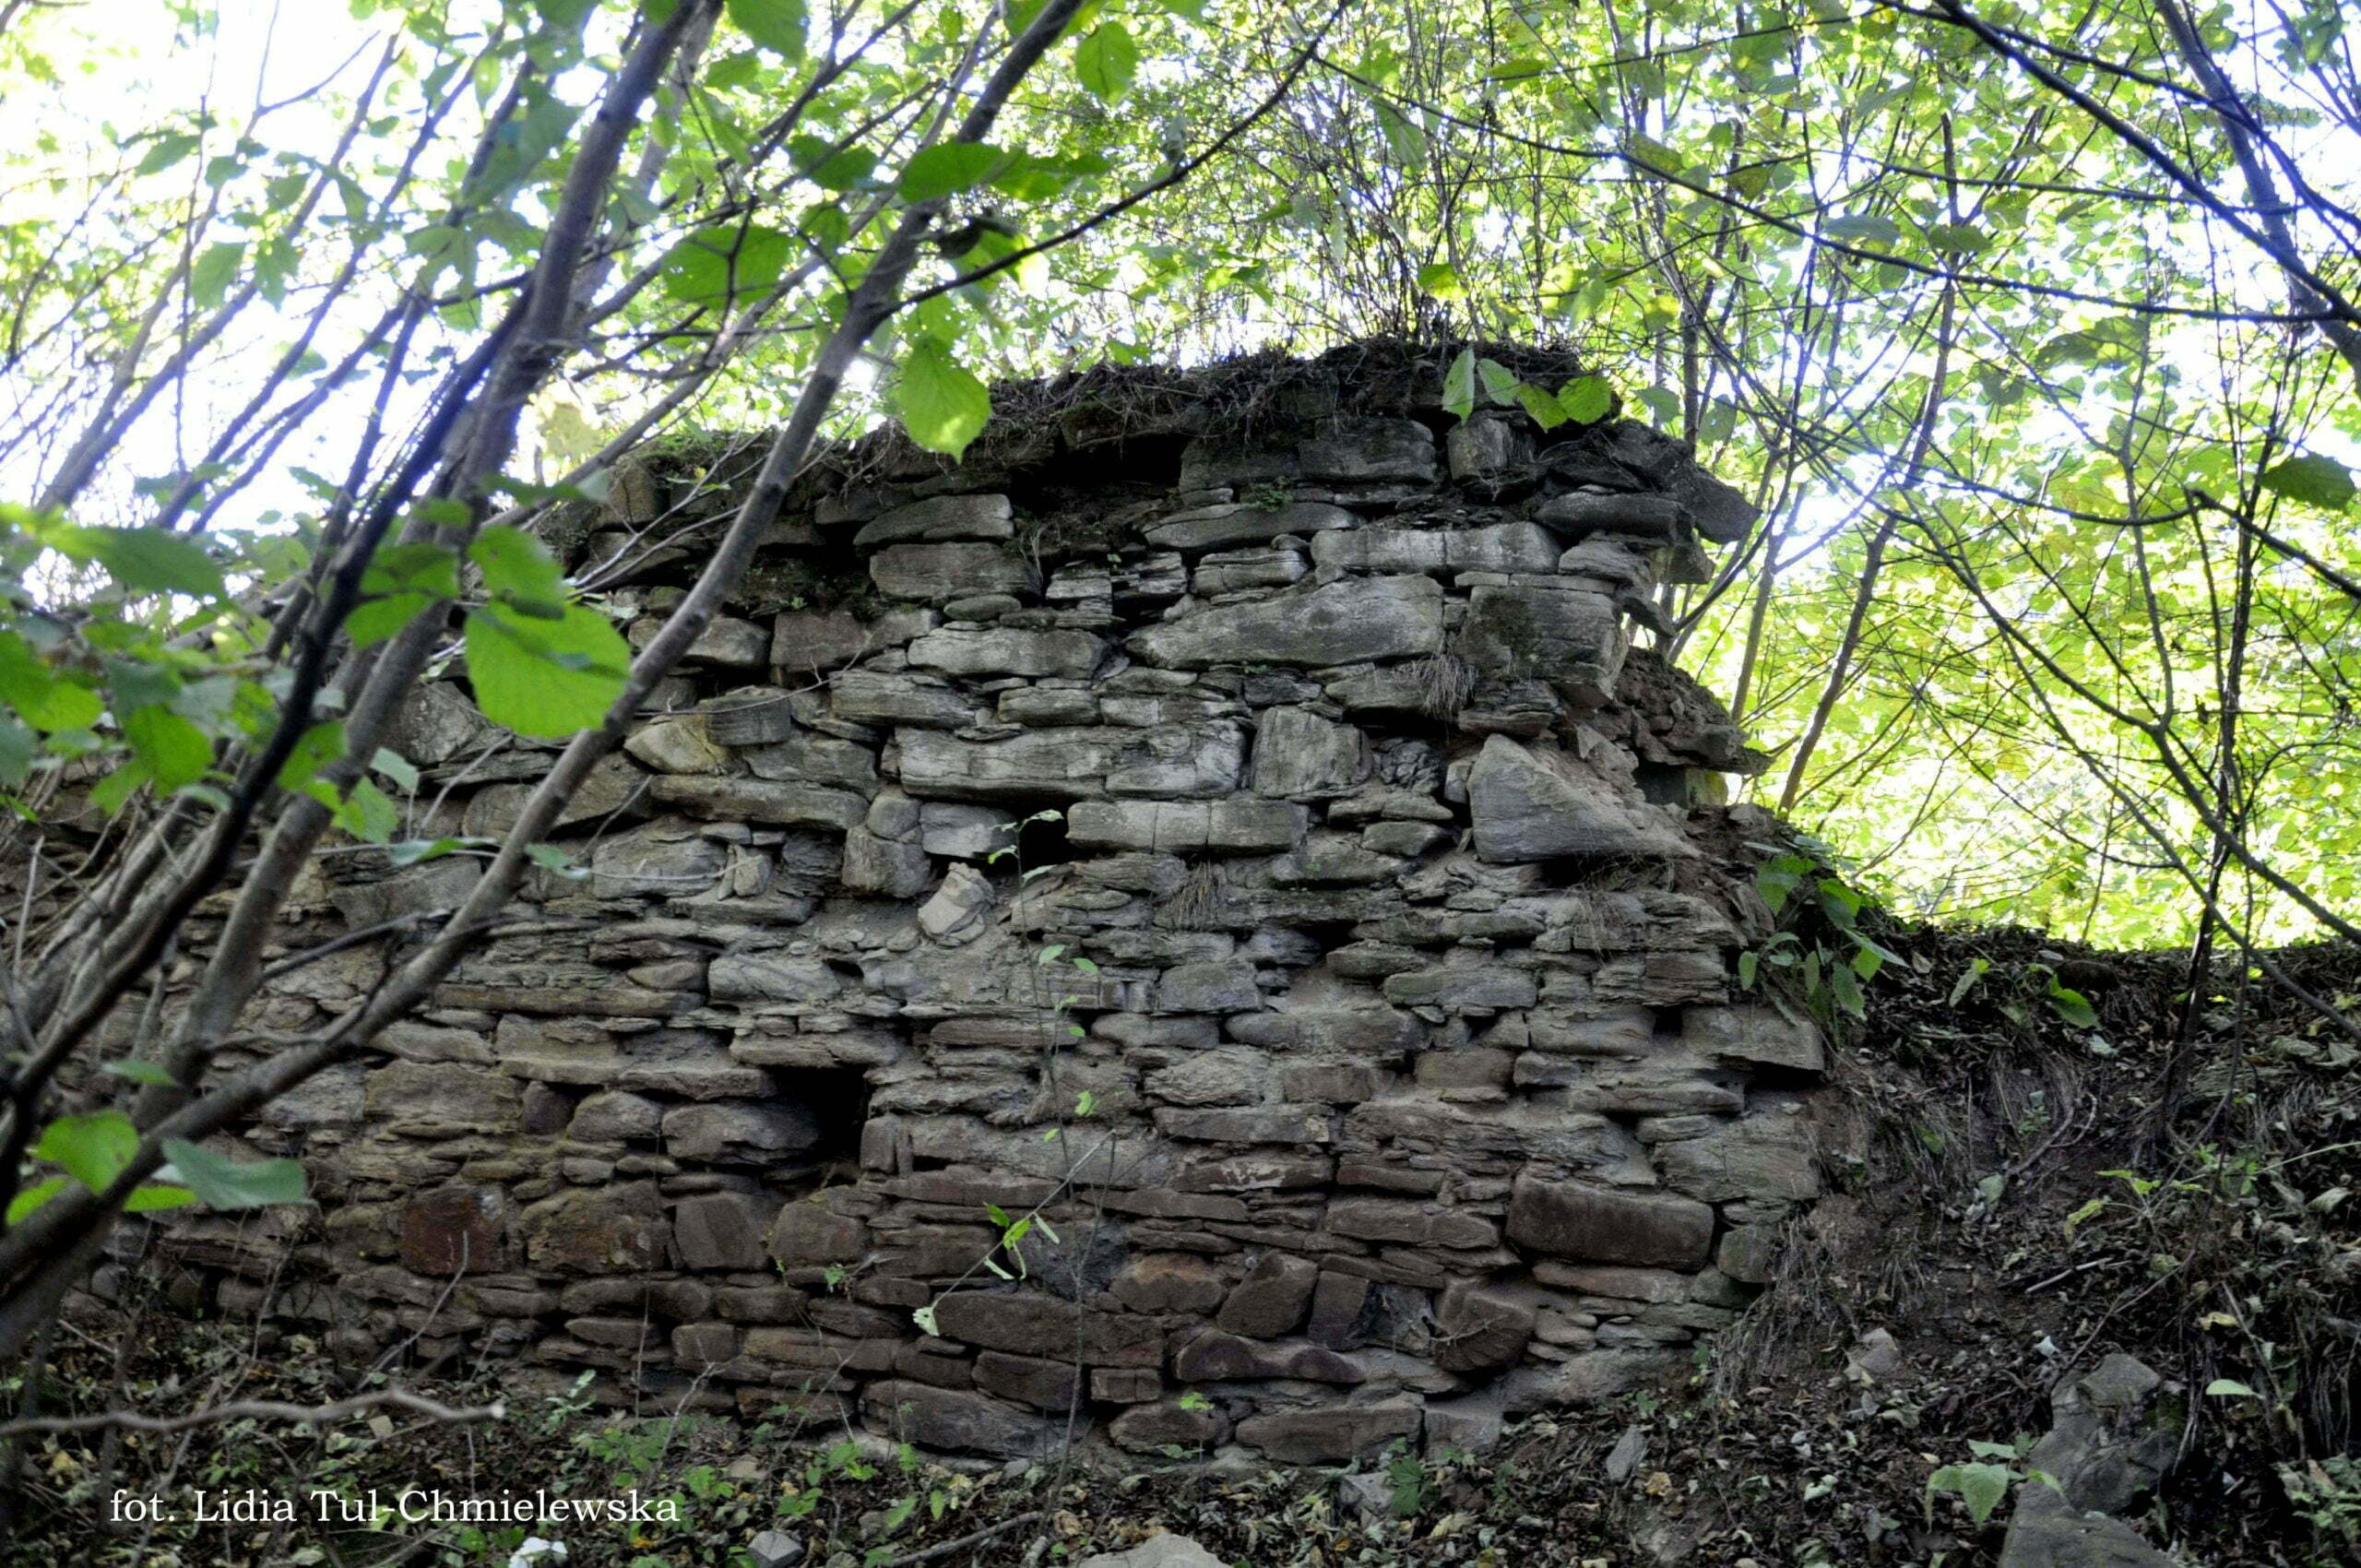 Ruiny dworu Krywe fot. Lidia Tul-Chmielewska